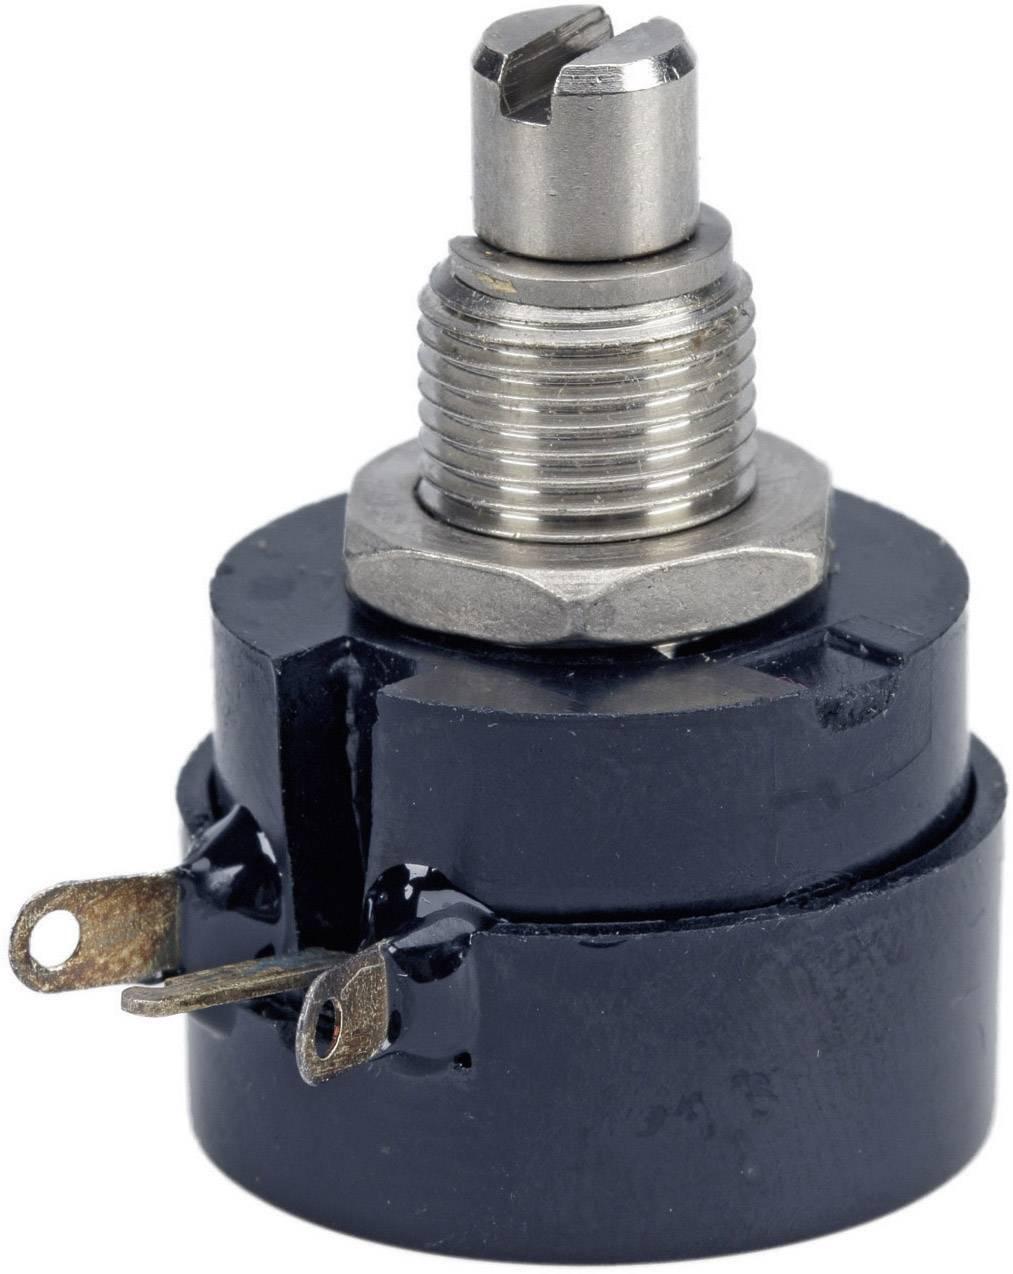 Drôtový potenciometer mono TT Electronics AB 3101106925 3101106925, 0.5 W, 250 Ohm, 1 ks